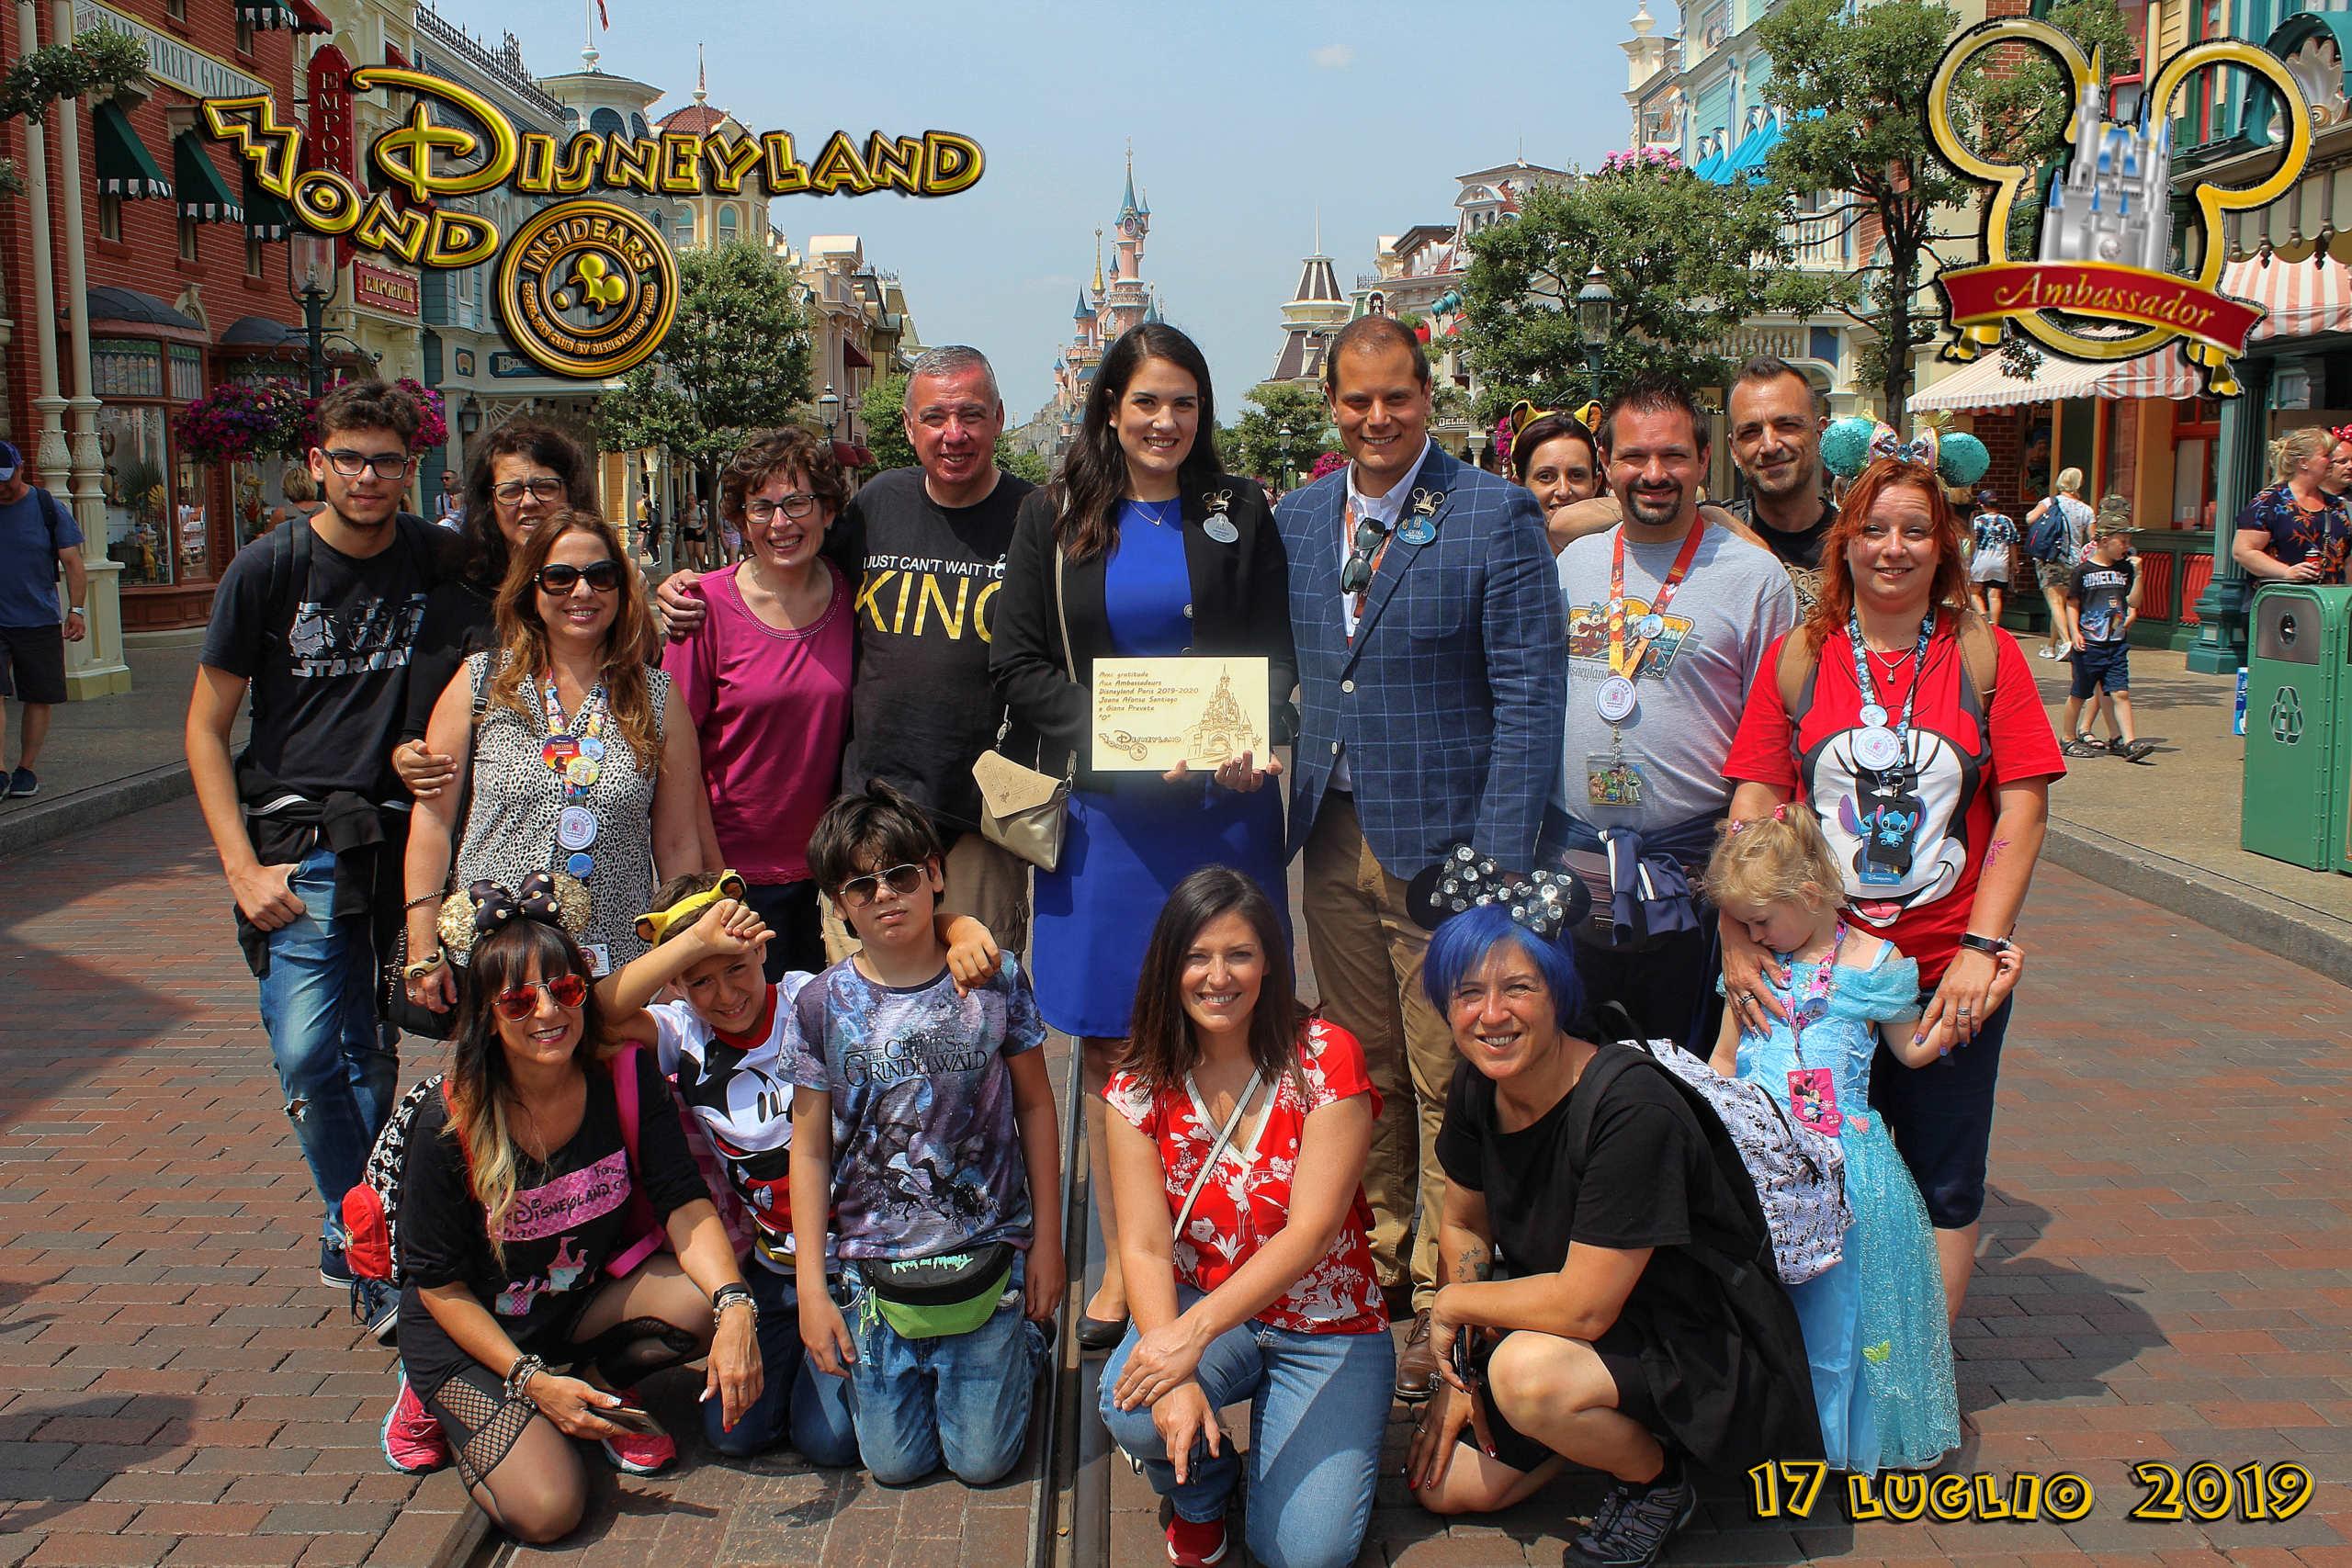 Ambasciatori Disneyland Paris 2019 - 2020 - Pagina 3 Img_4917